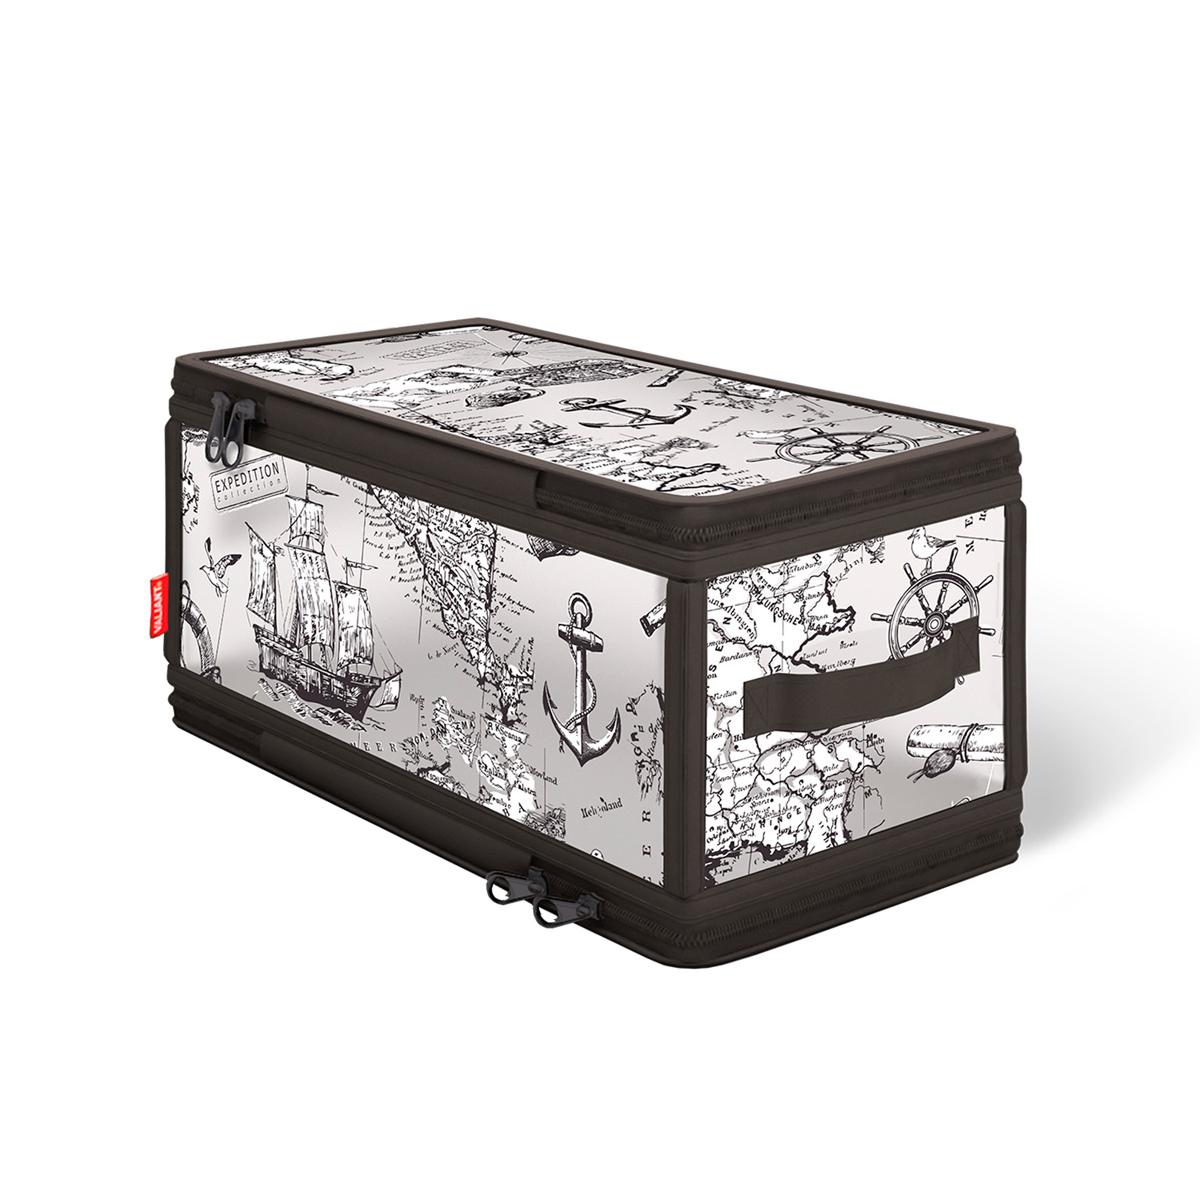 Кофр для хранения Valiant Expedition, с застежкой-молнией, 30 см х 15 см х 15 см кофр для хранения valiant japanese white с застежкой молнией 30 х 28 х 15 см